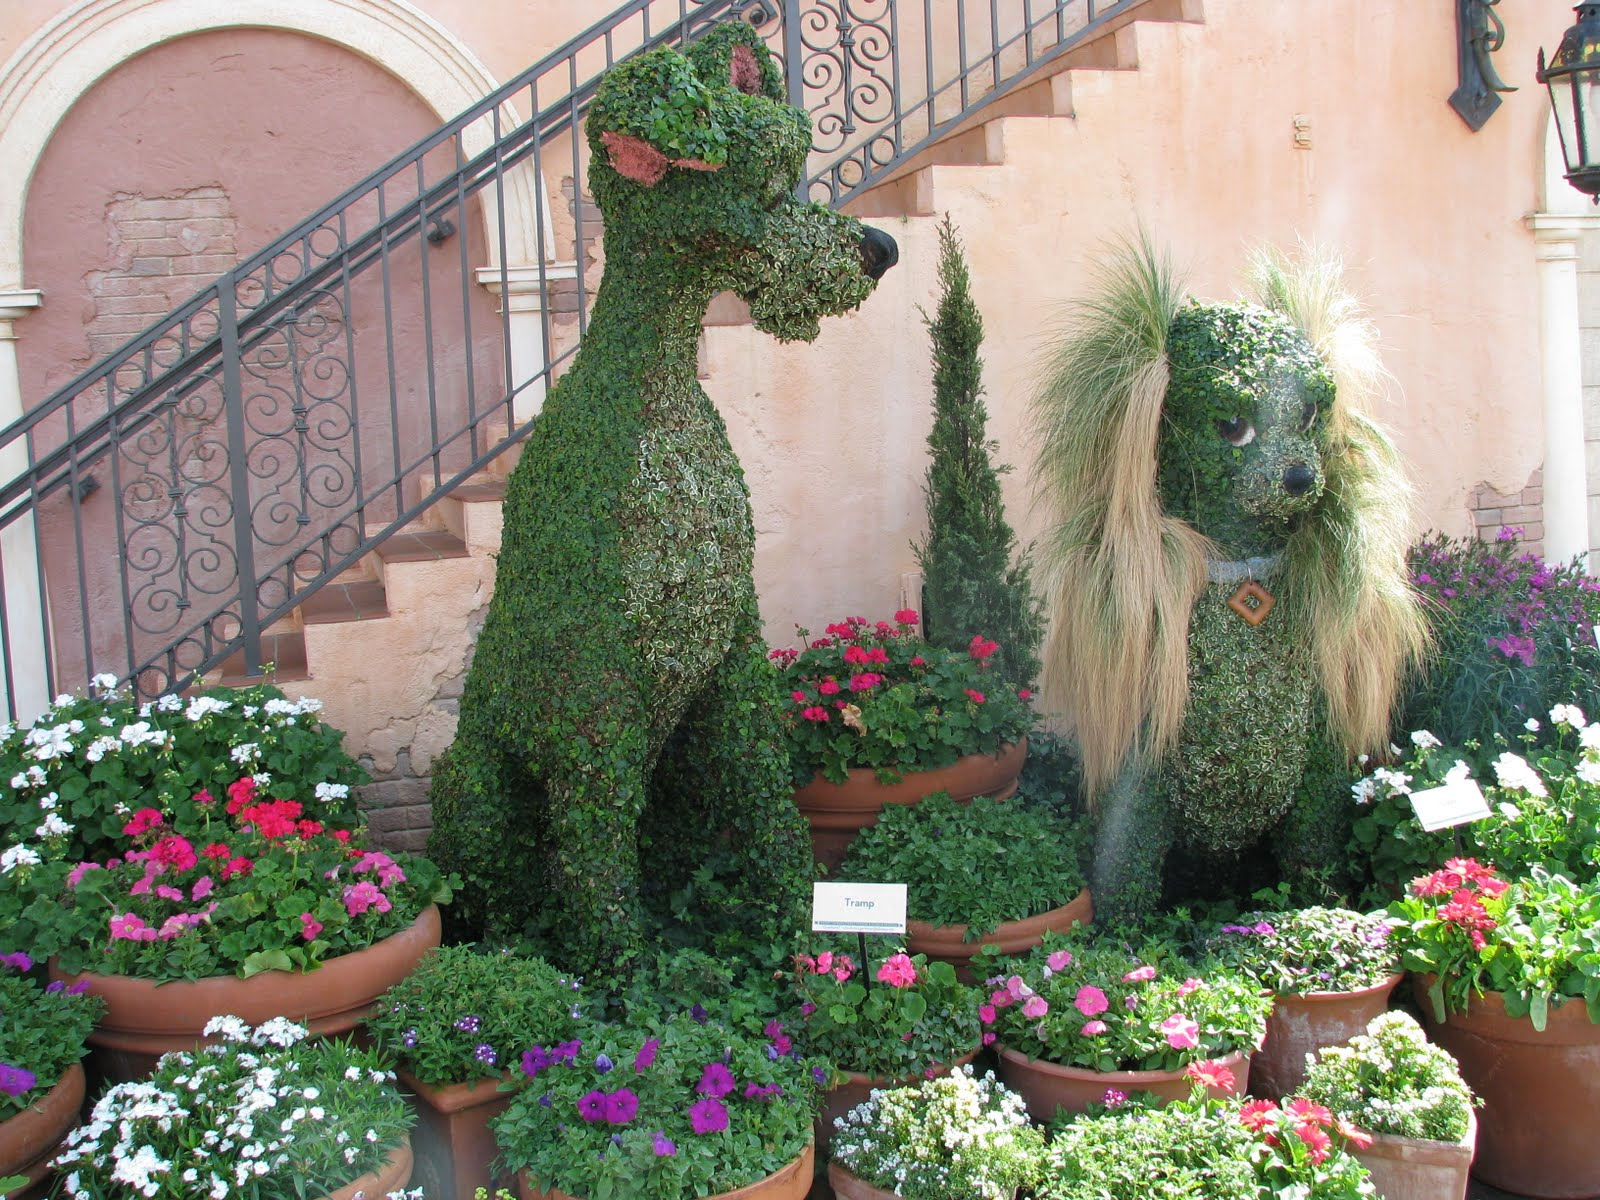 2010 Epcot Flower & Garden Festival: Topiary Pictures  Disney World Blog...